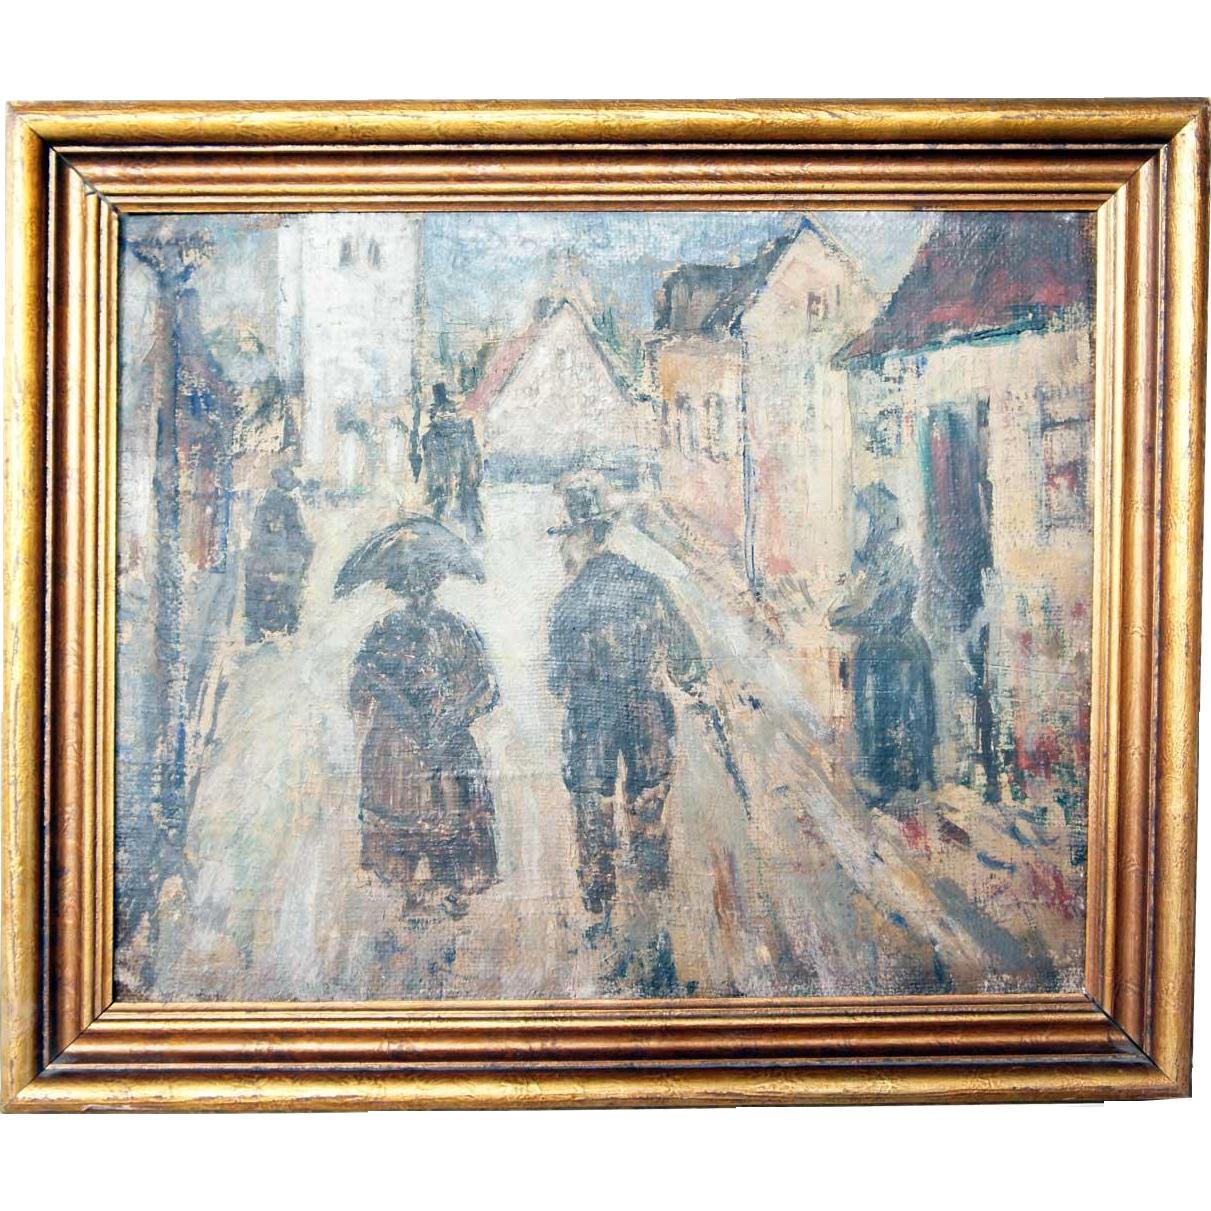 EMIEL HANSEN Oil on Canvas on Board Painting, Afternoon Walk